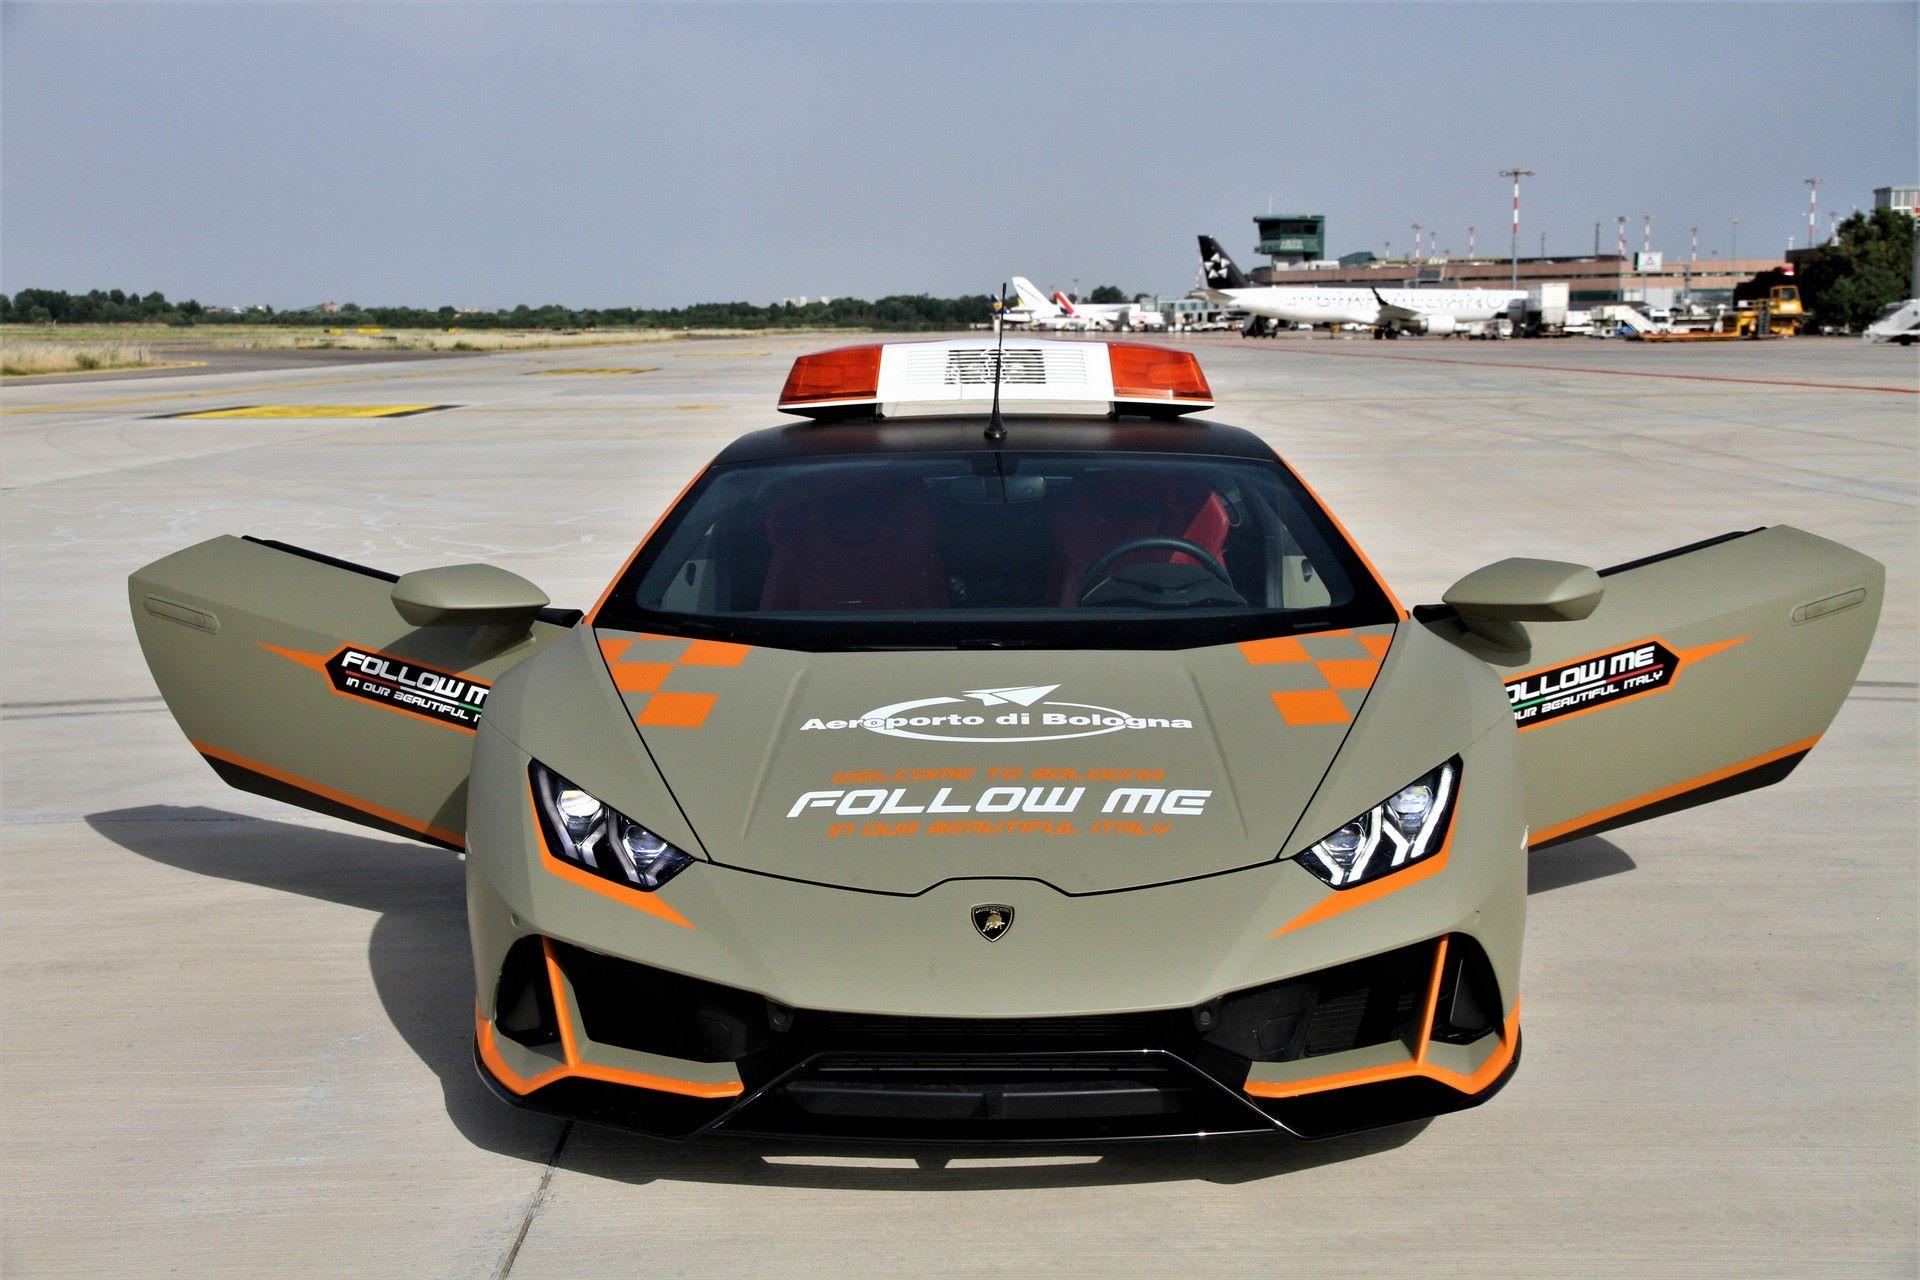 Lamborghini-Huracan-Evo-Follow-Me-bologna-airport-2021-9